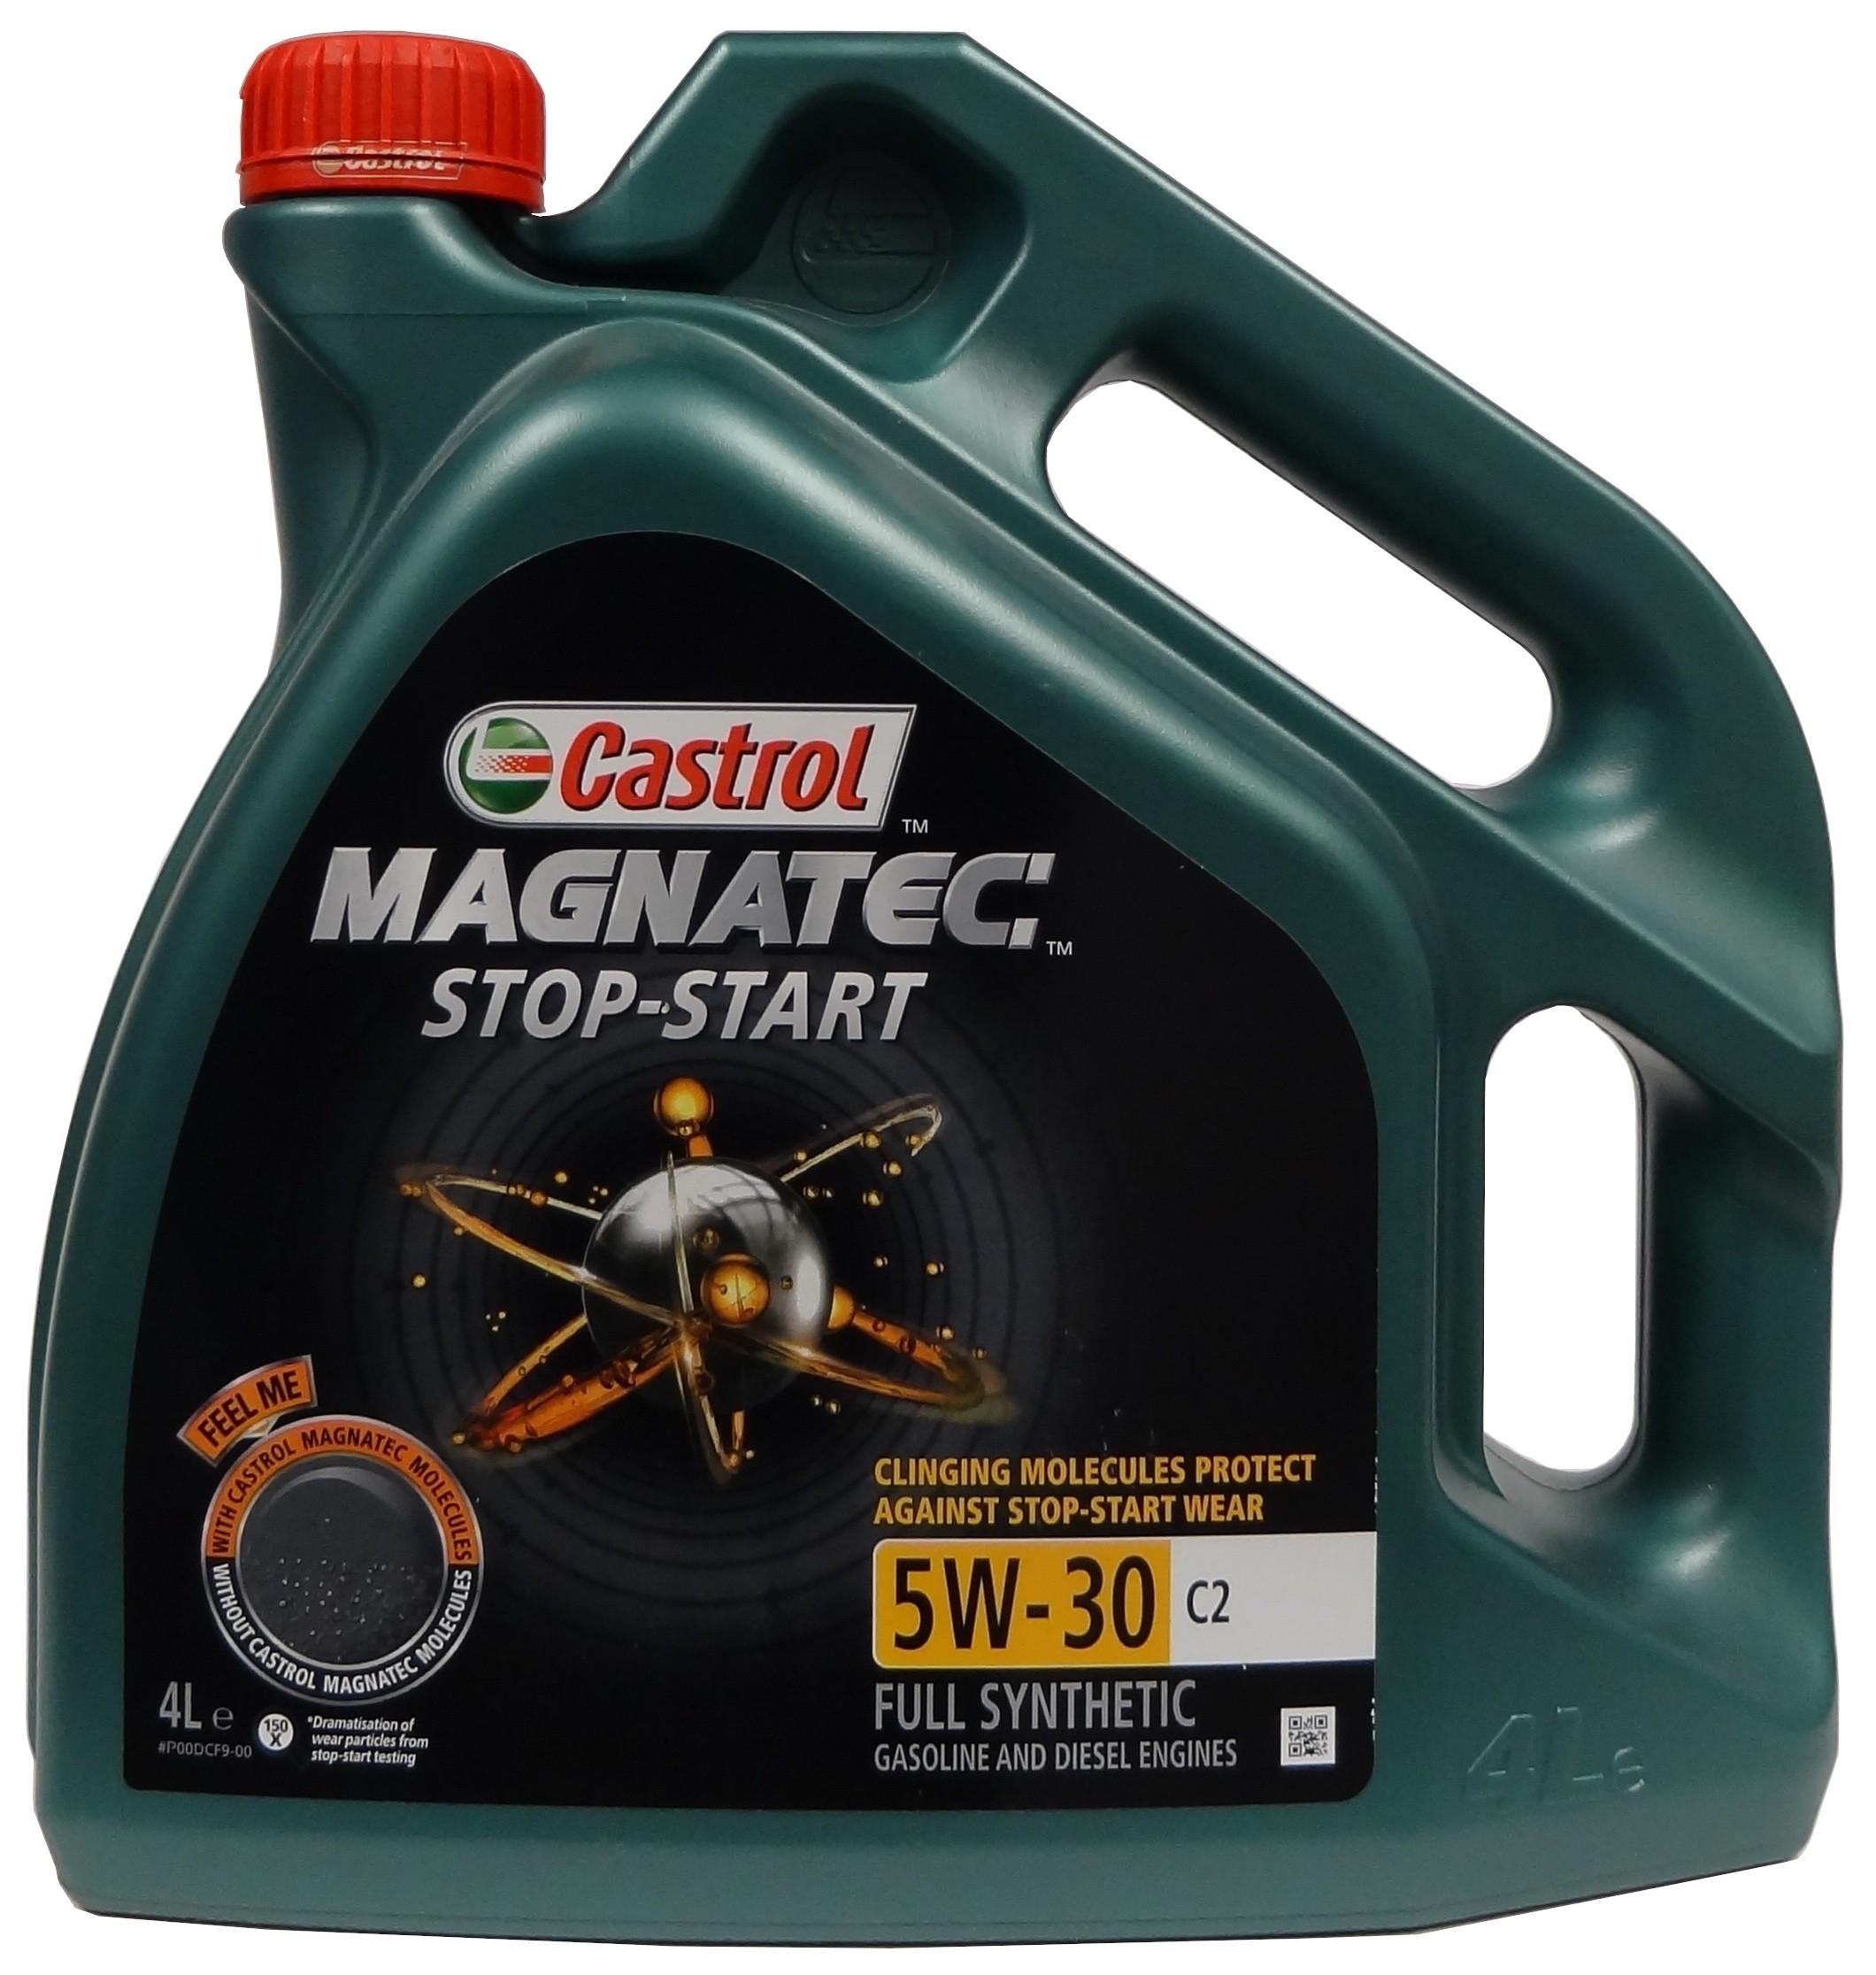 CASTROL Magnatec 5W-30 C2 Stop-Start 4L